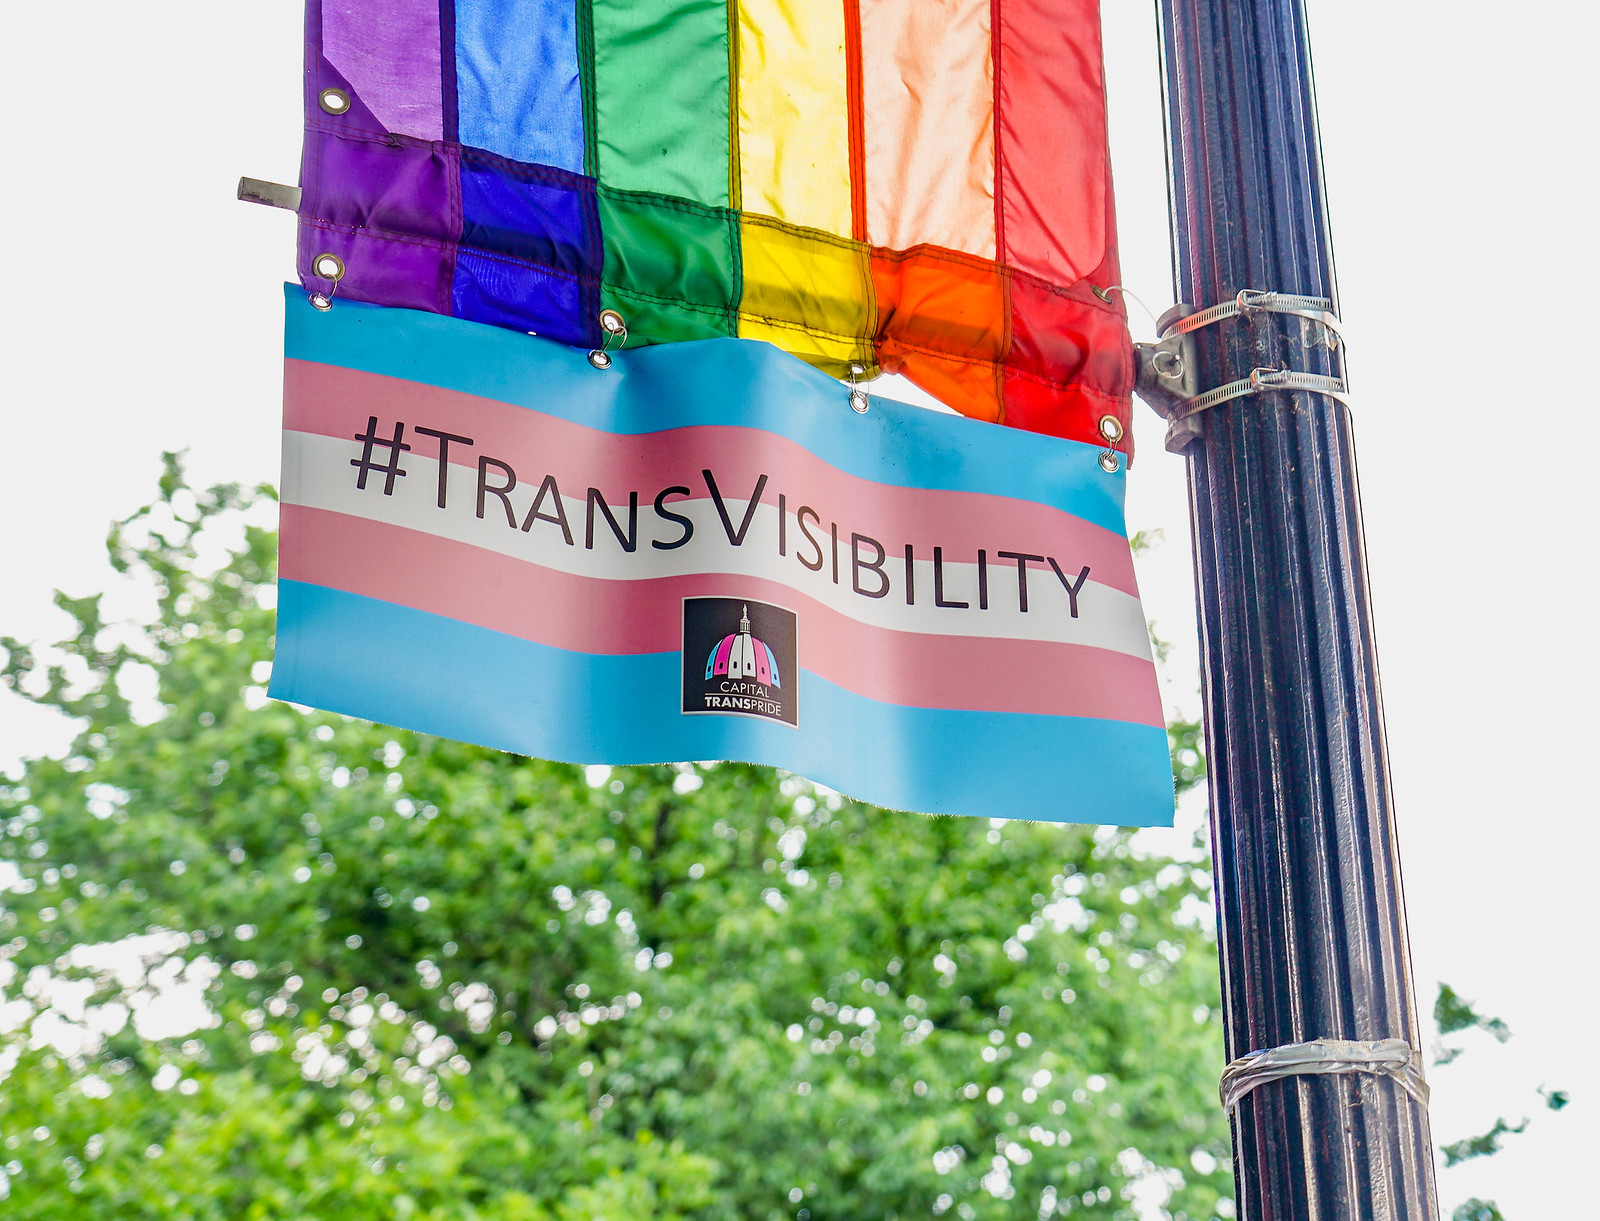 Thanks for Publishing my Photograph, in Fillmore bills target Arizona transgender community | Arizona Mirror